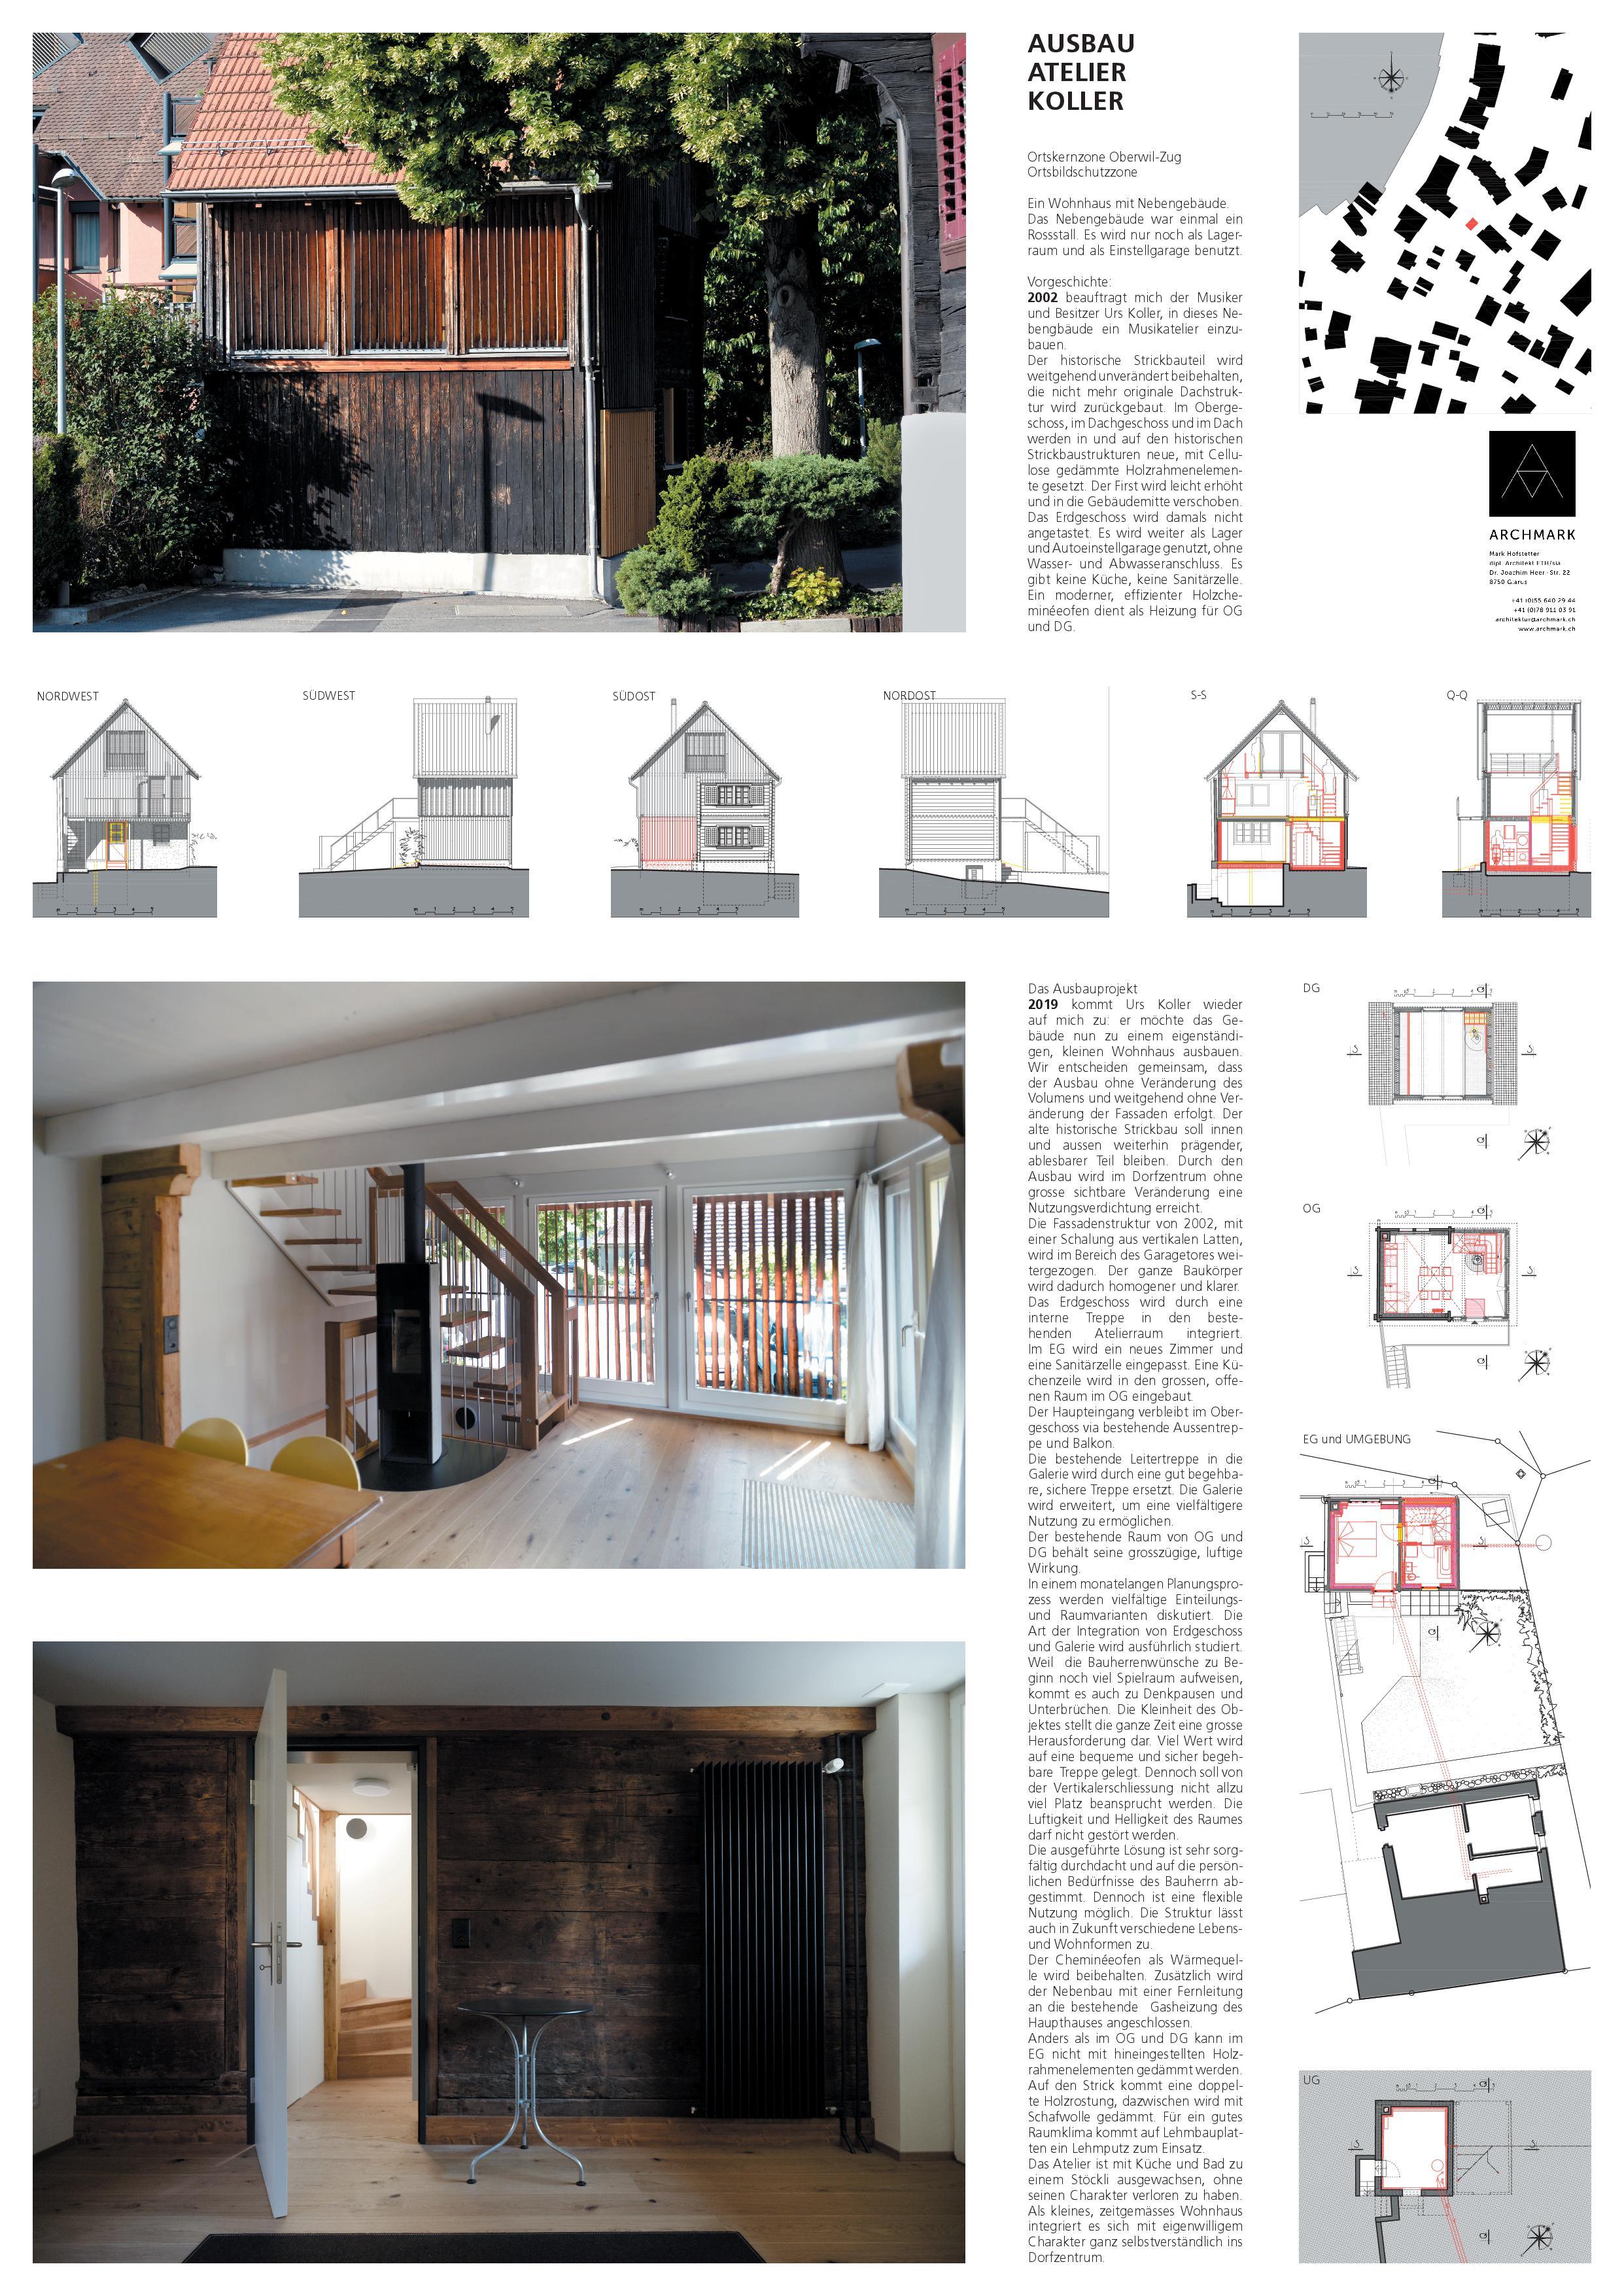 AO-Plan Ausbau Atelier Koller de Dipl. Architekt ETH/SIA<br/>